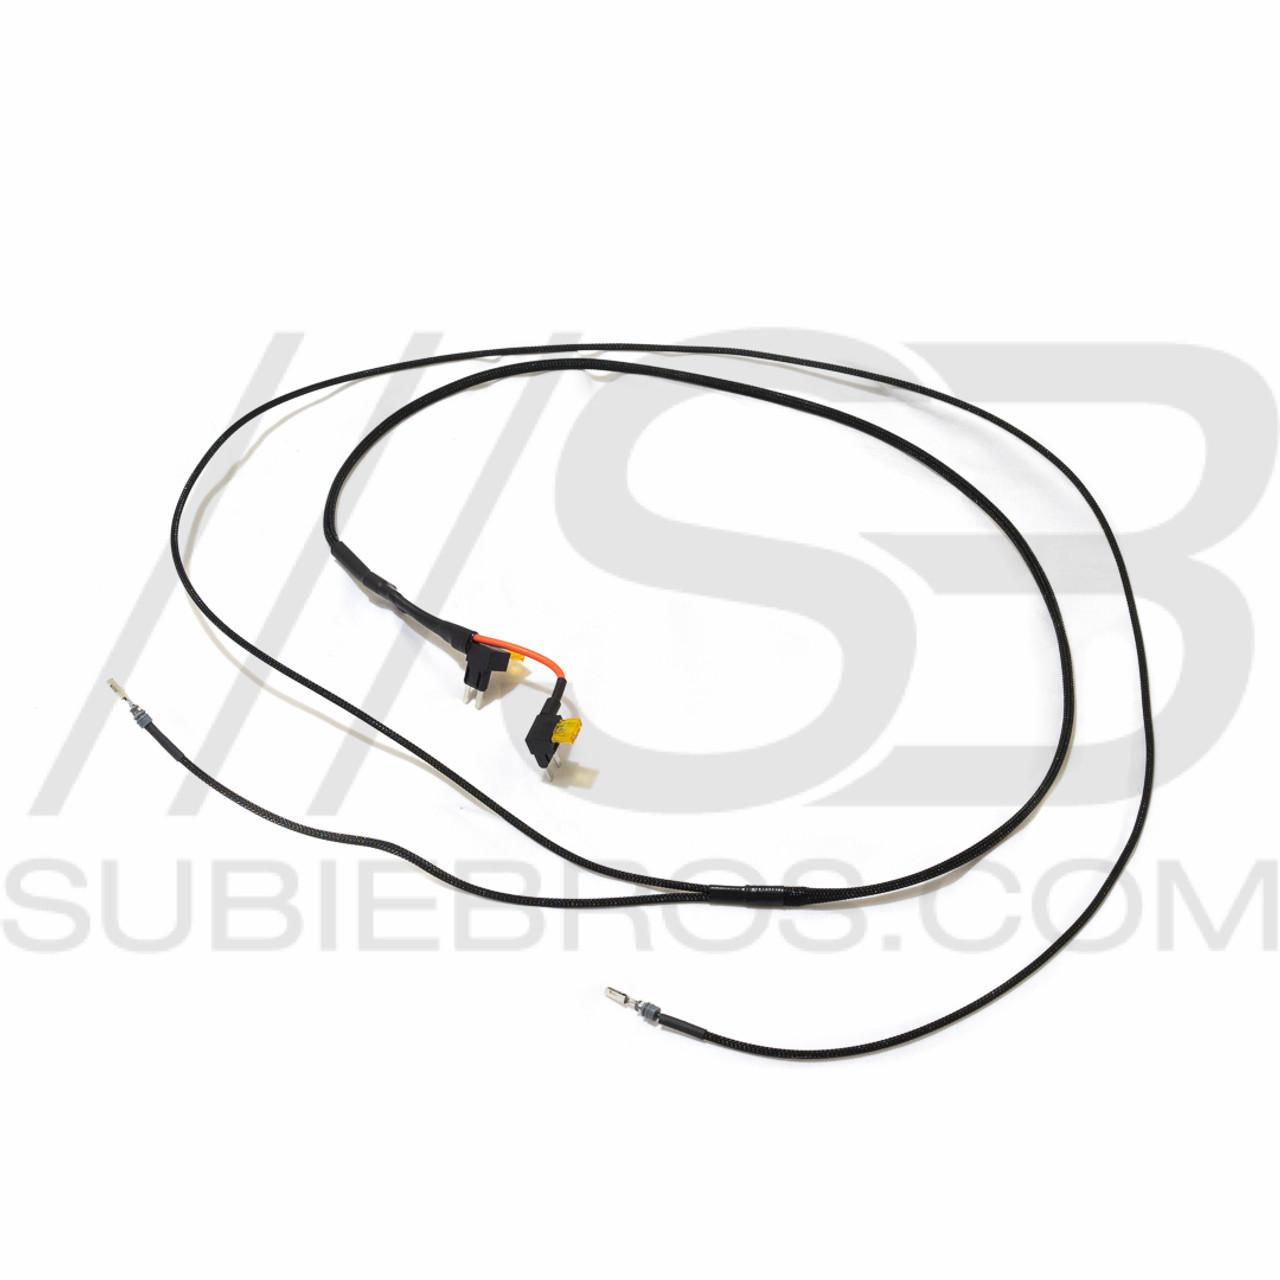 subiebros c-light drl harness